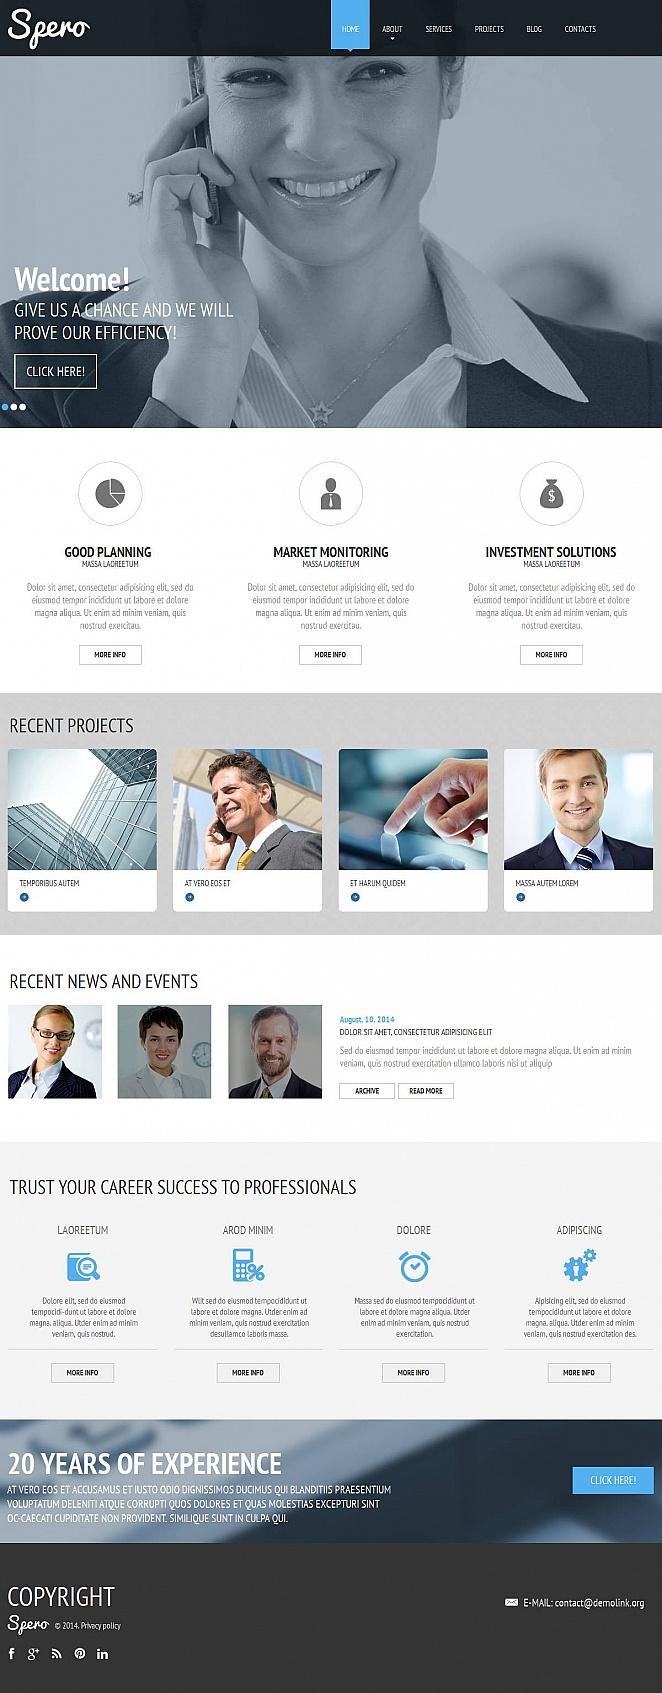 Business Website Template for Entrepreneurs - image